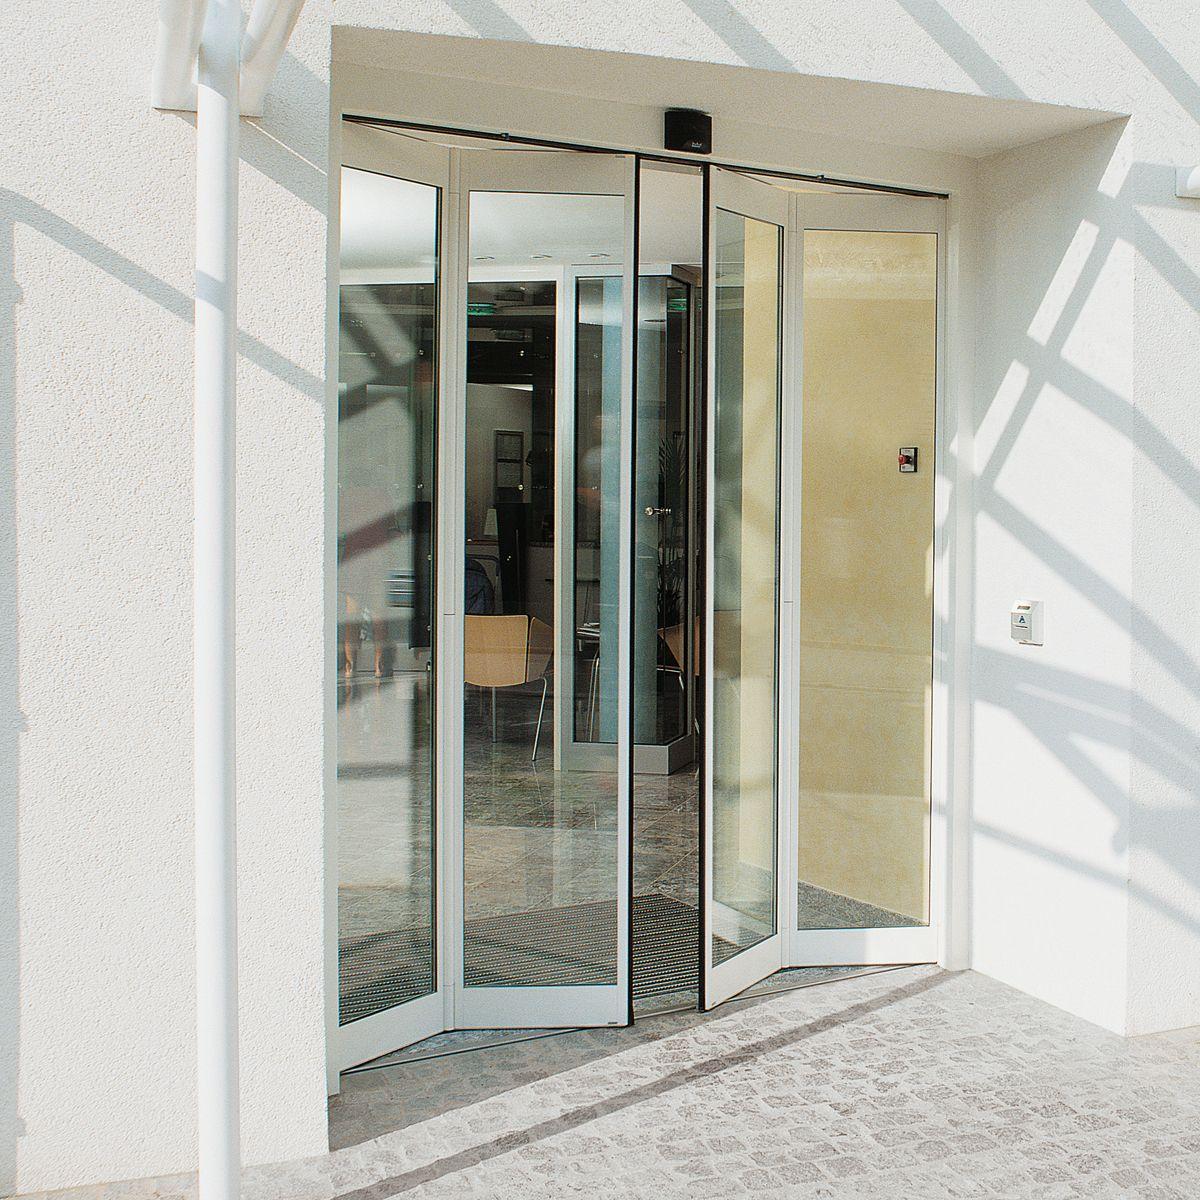 DORMA FFT BI-FOLDING DOORS Automatic bi-folding door with slender fine- & DORMA FFT BI-FOLDING DOORS: Automatic bi-folding door with slender ...